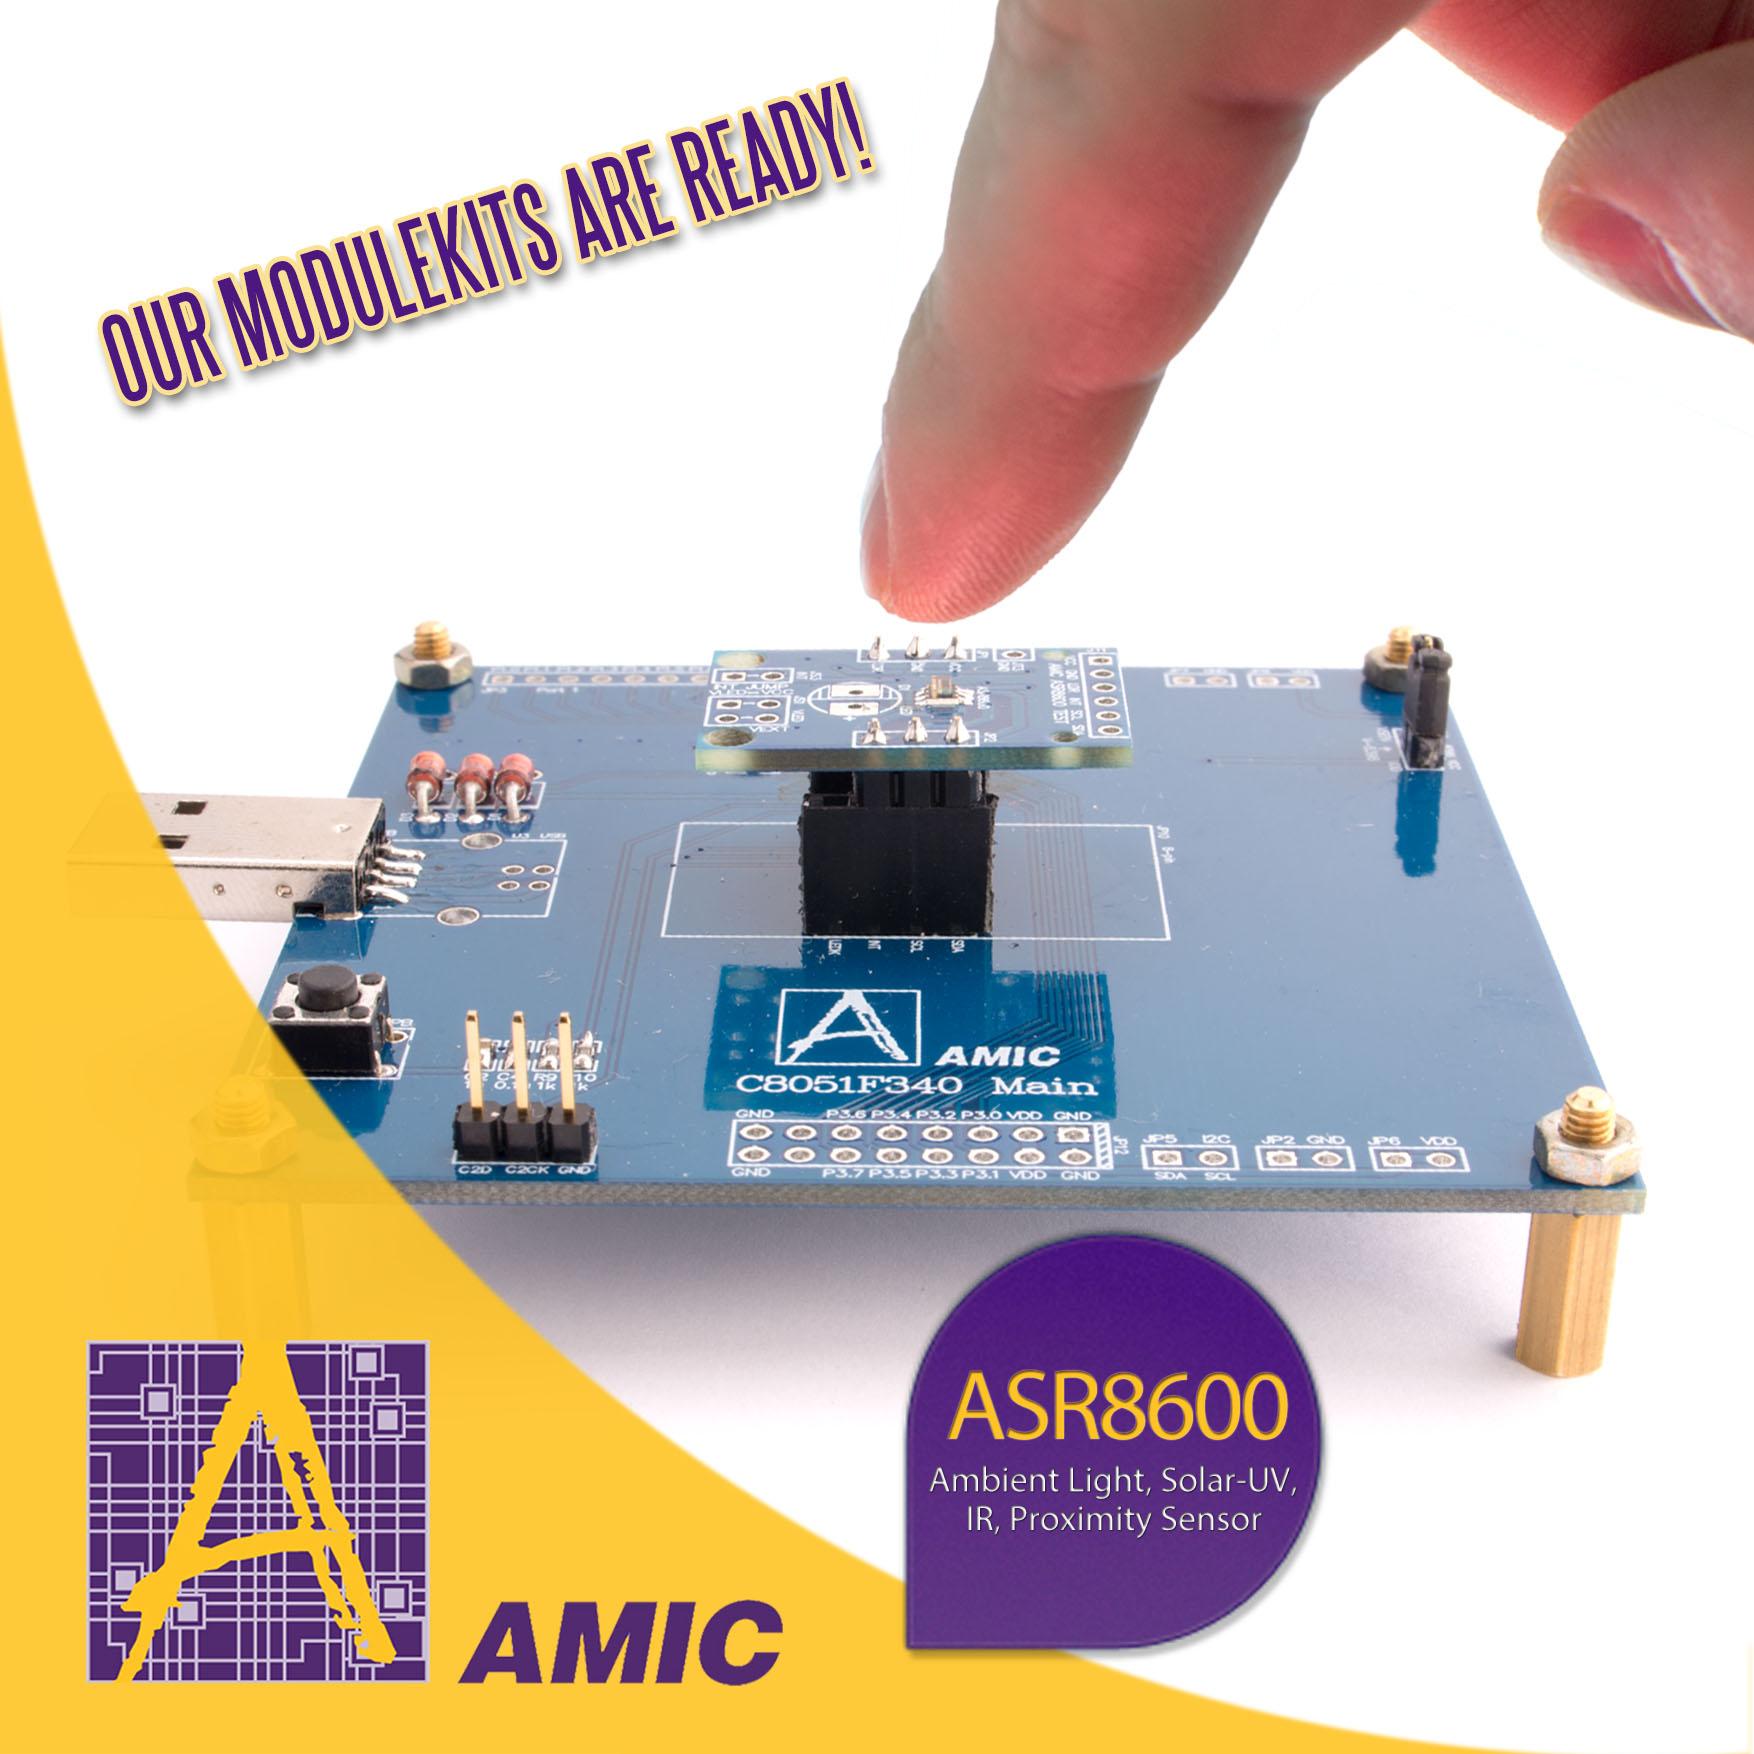 ASRA-00-8600_square